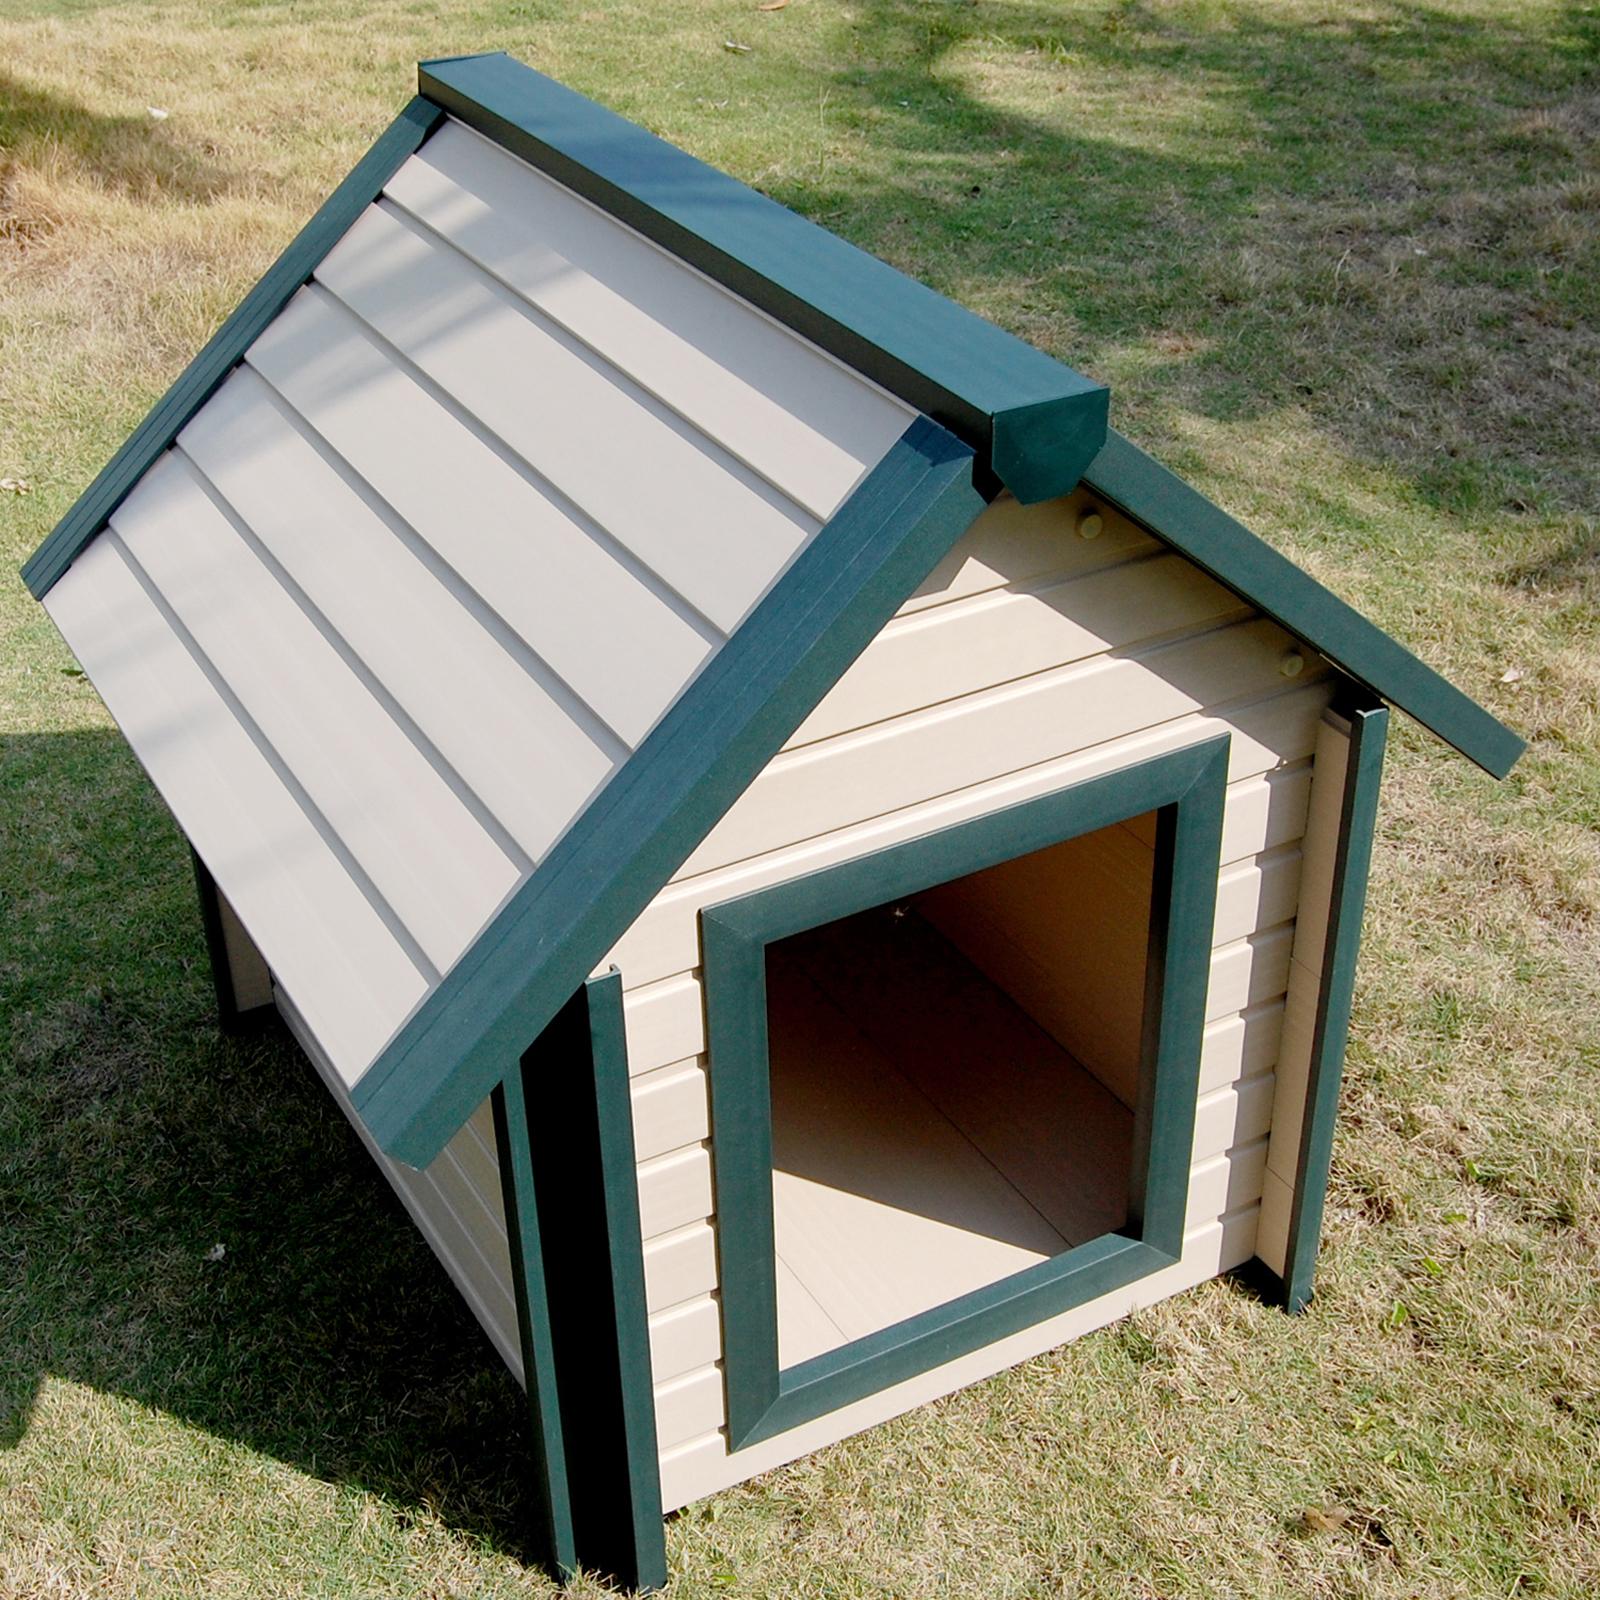 Sehr grosse Ecoflex Hundehütte aus 100% Recyclingmaterial